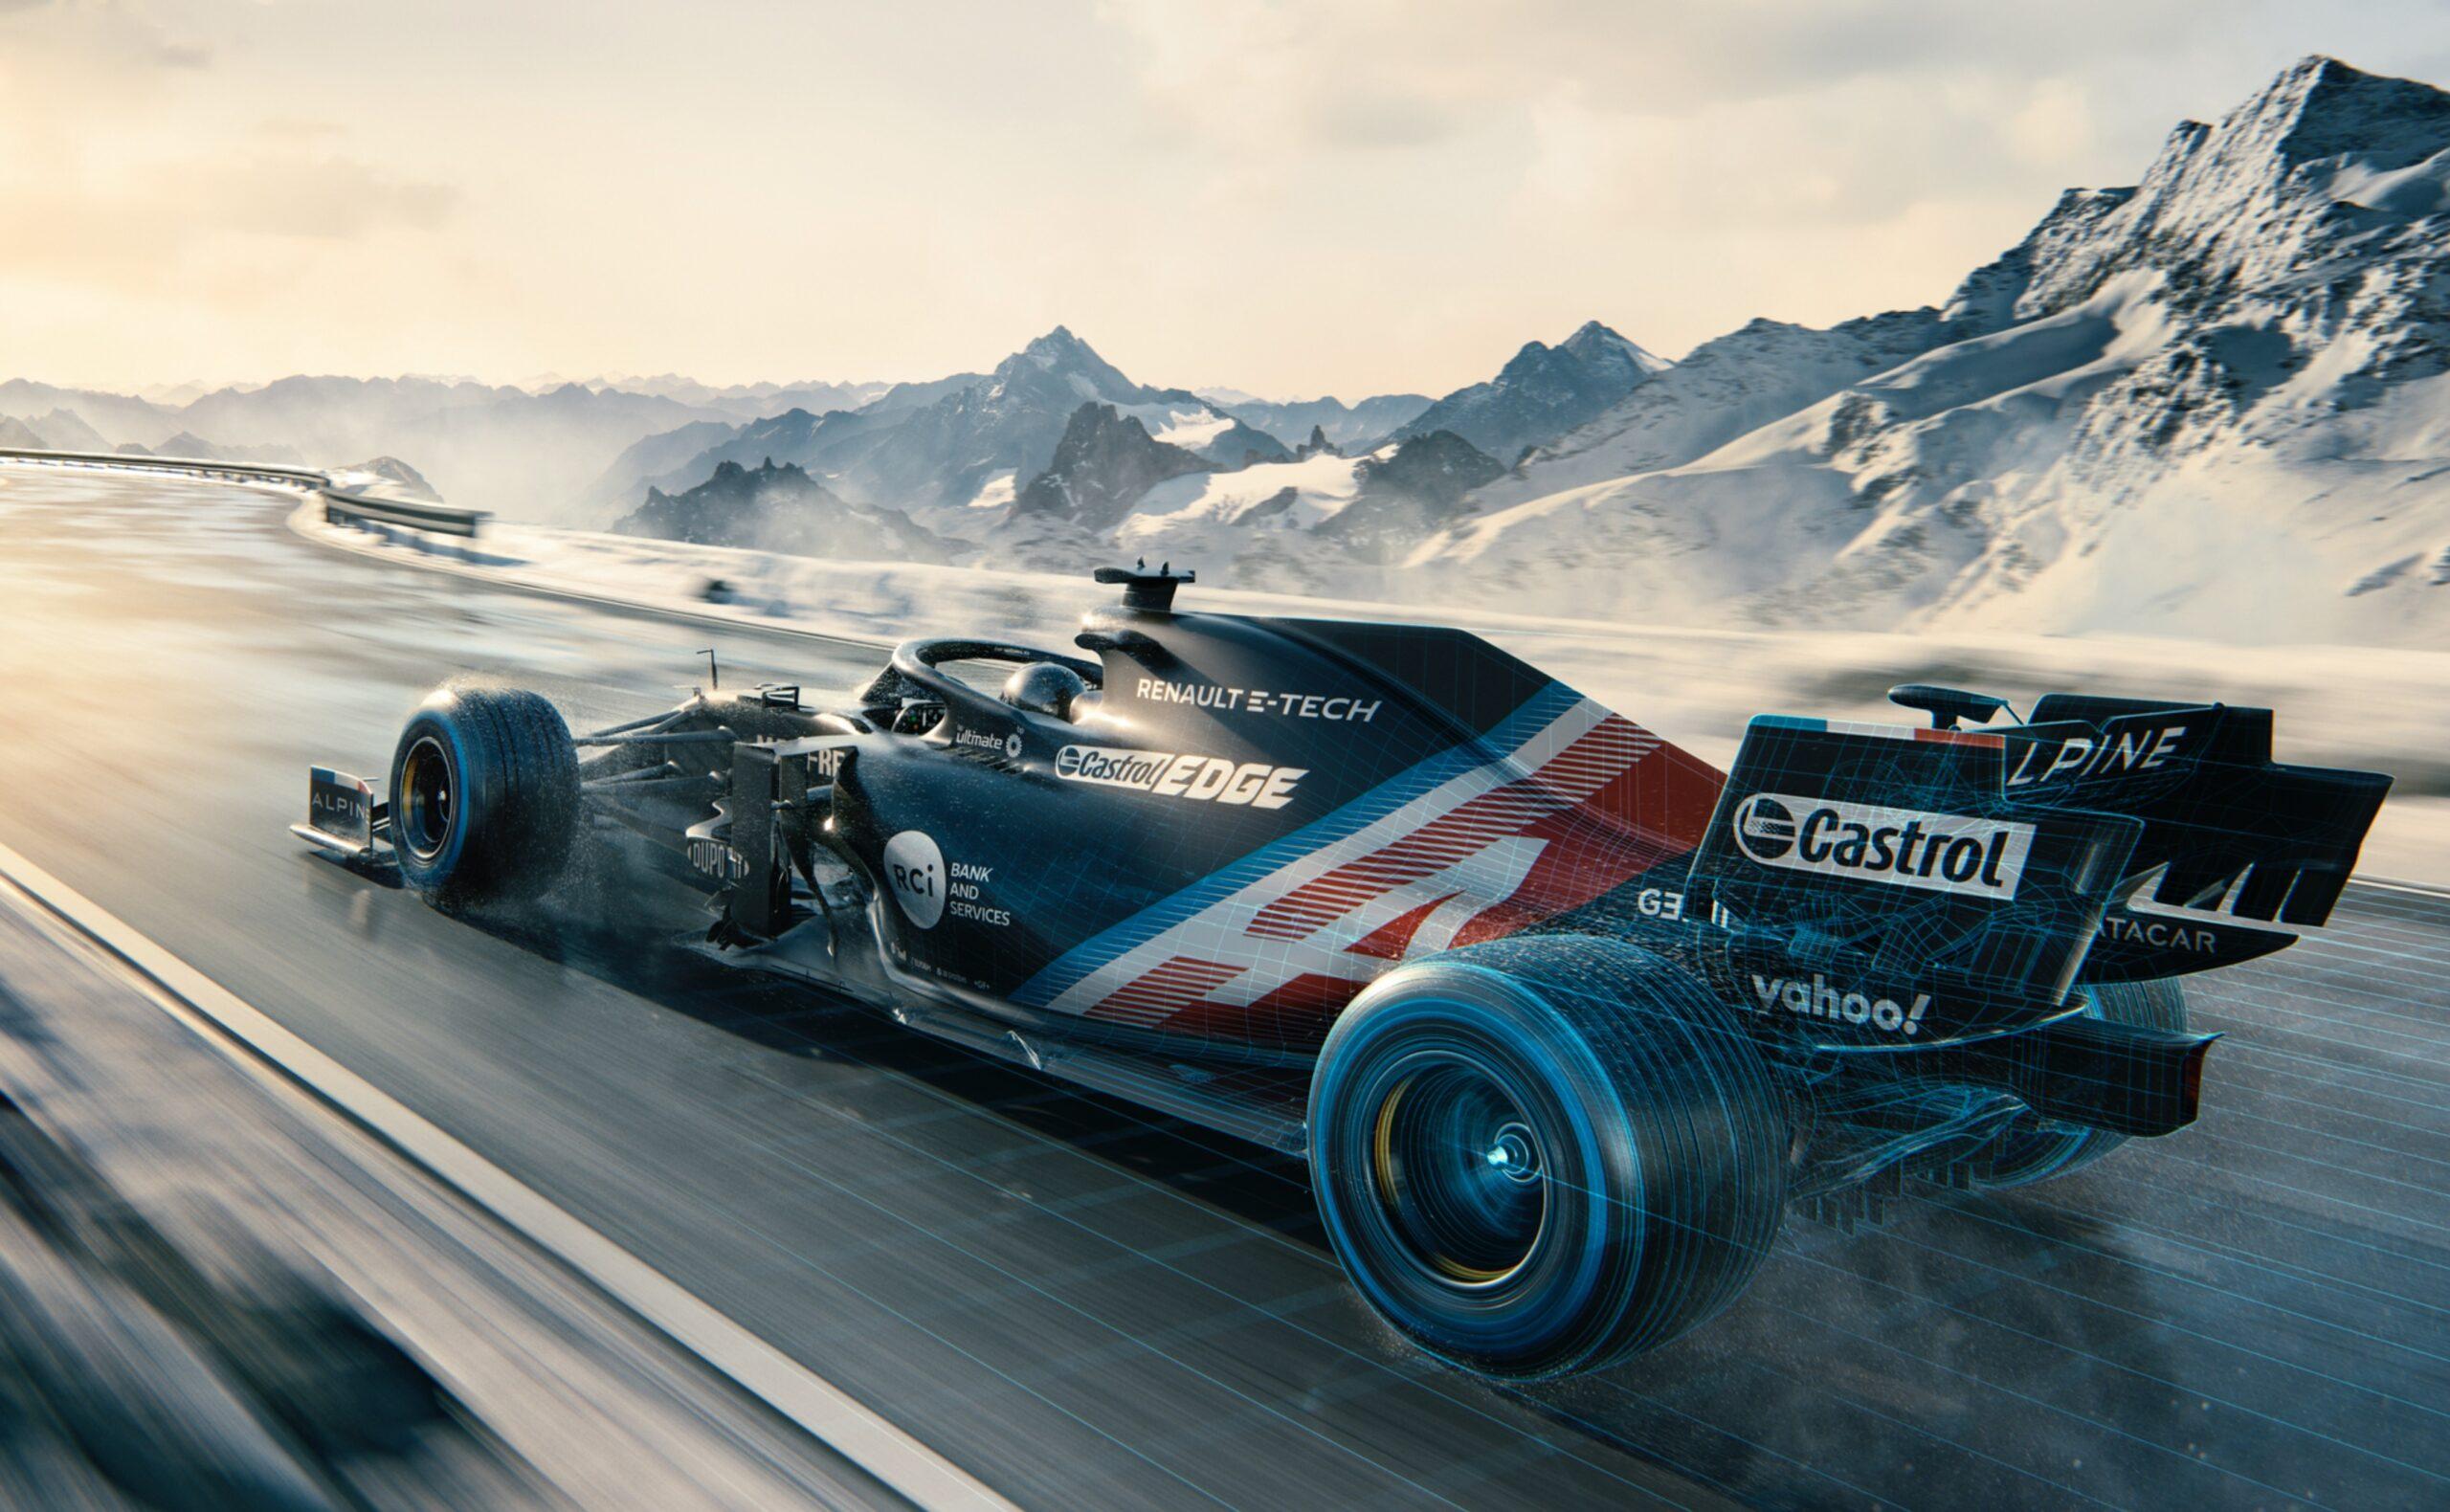 Renault Motorsport Alpine